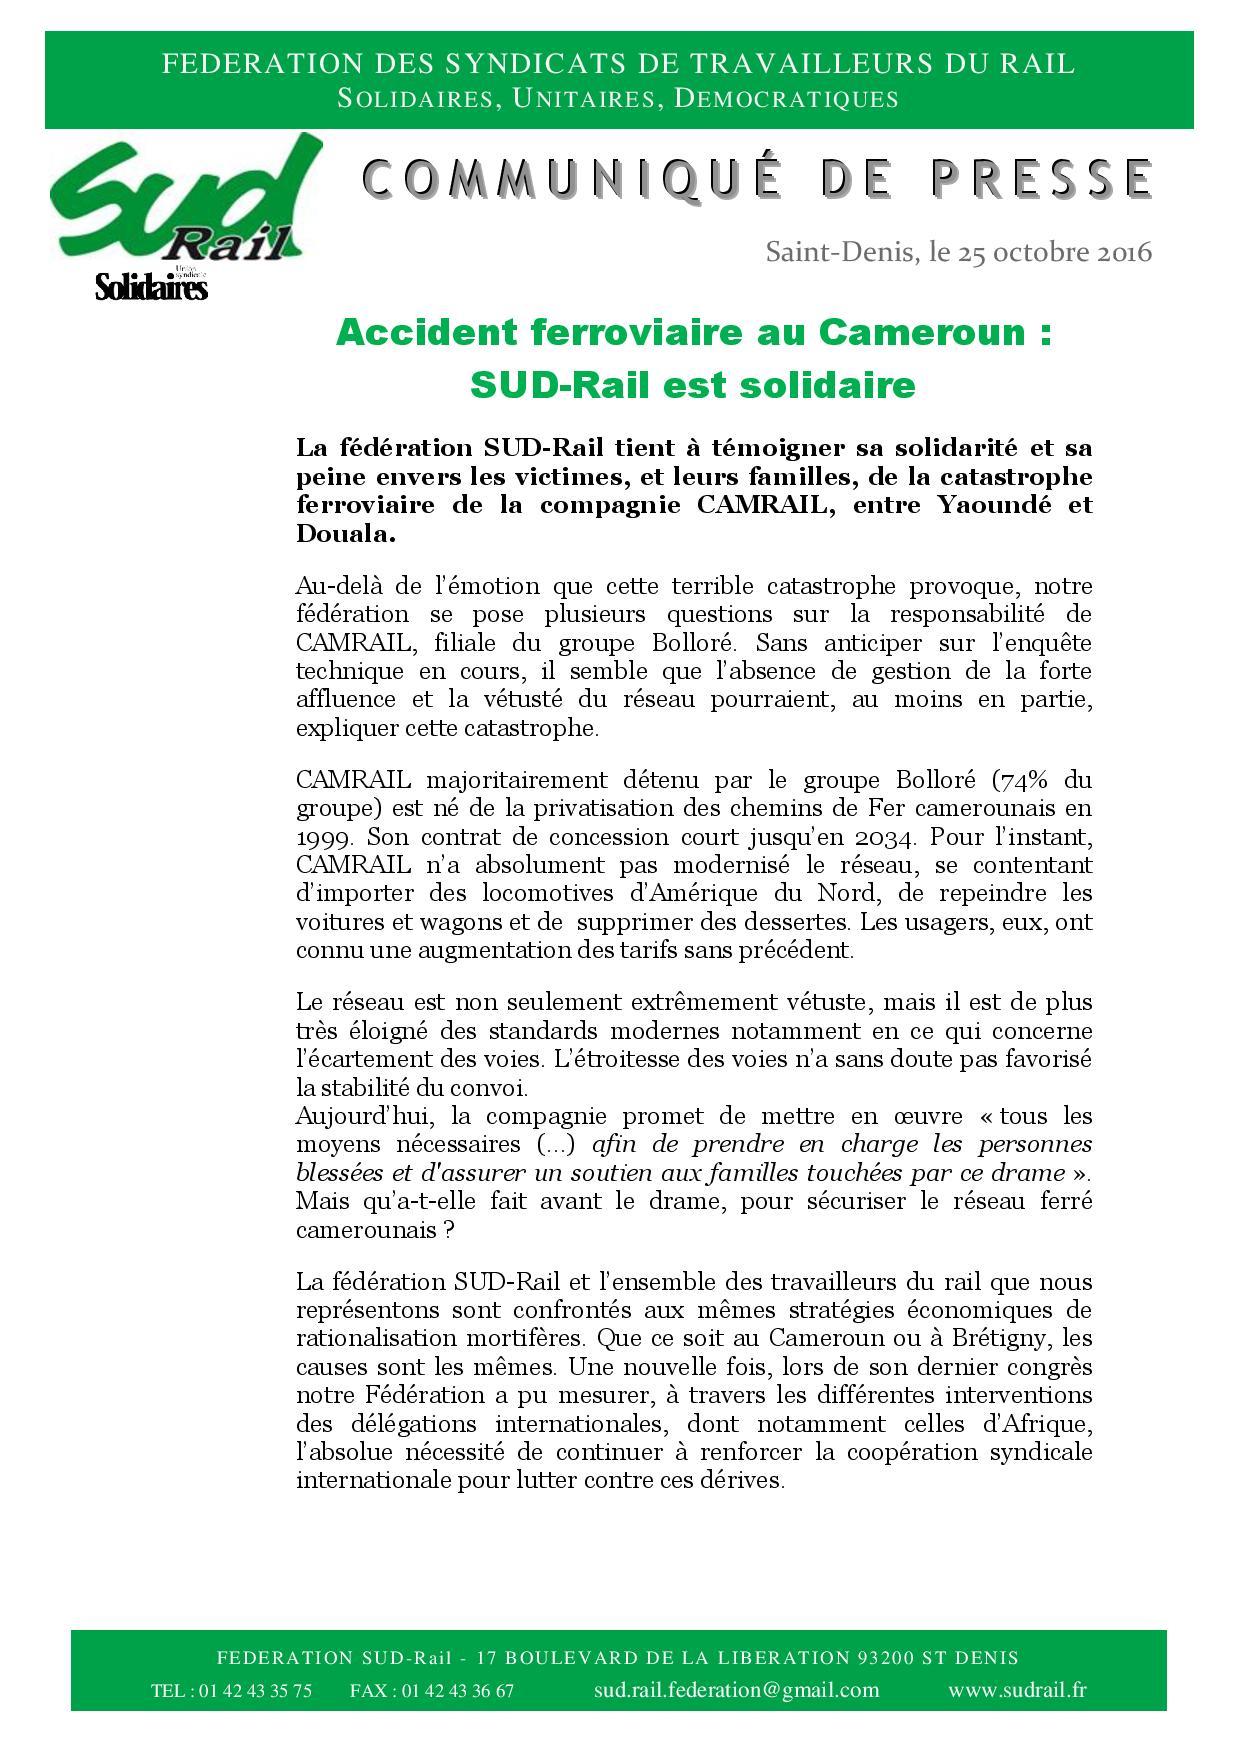 2016-10-25-communique-de-presse-accident-ferroviaire-cameroun-page-001